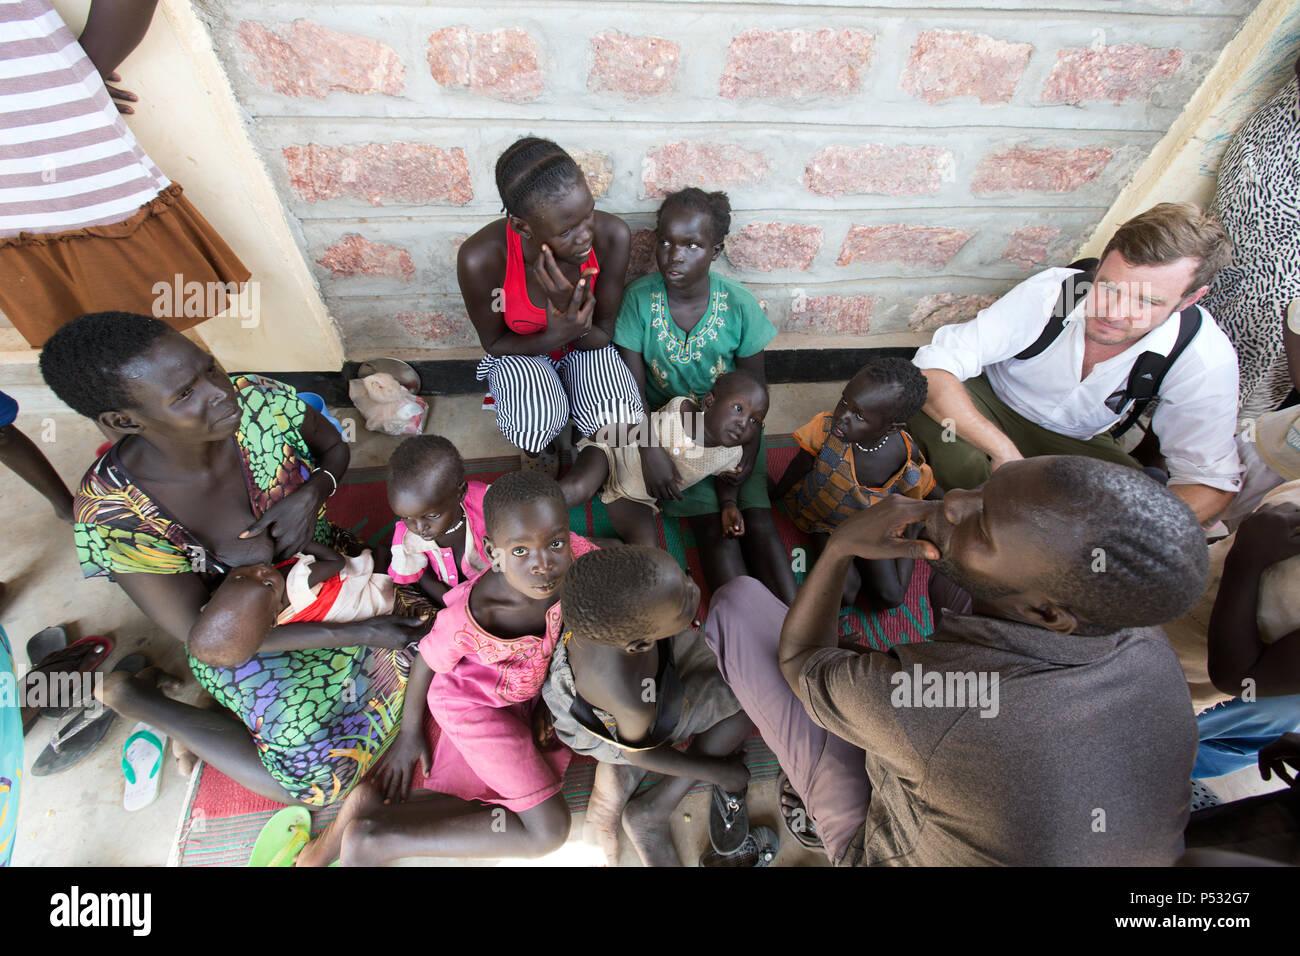 Kakuma, Kenya - Kai Feldhaus, journalist of the Bild newspaper in conversation with new arrivals in the Registration Center Kakuma. - Stock Image